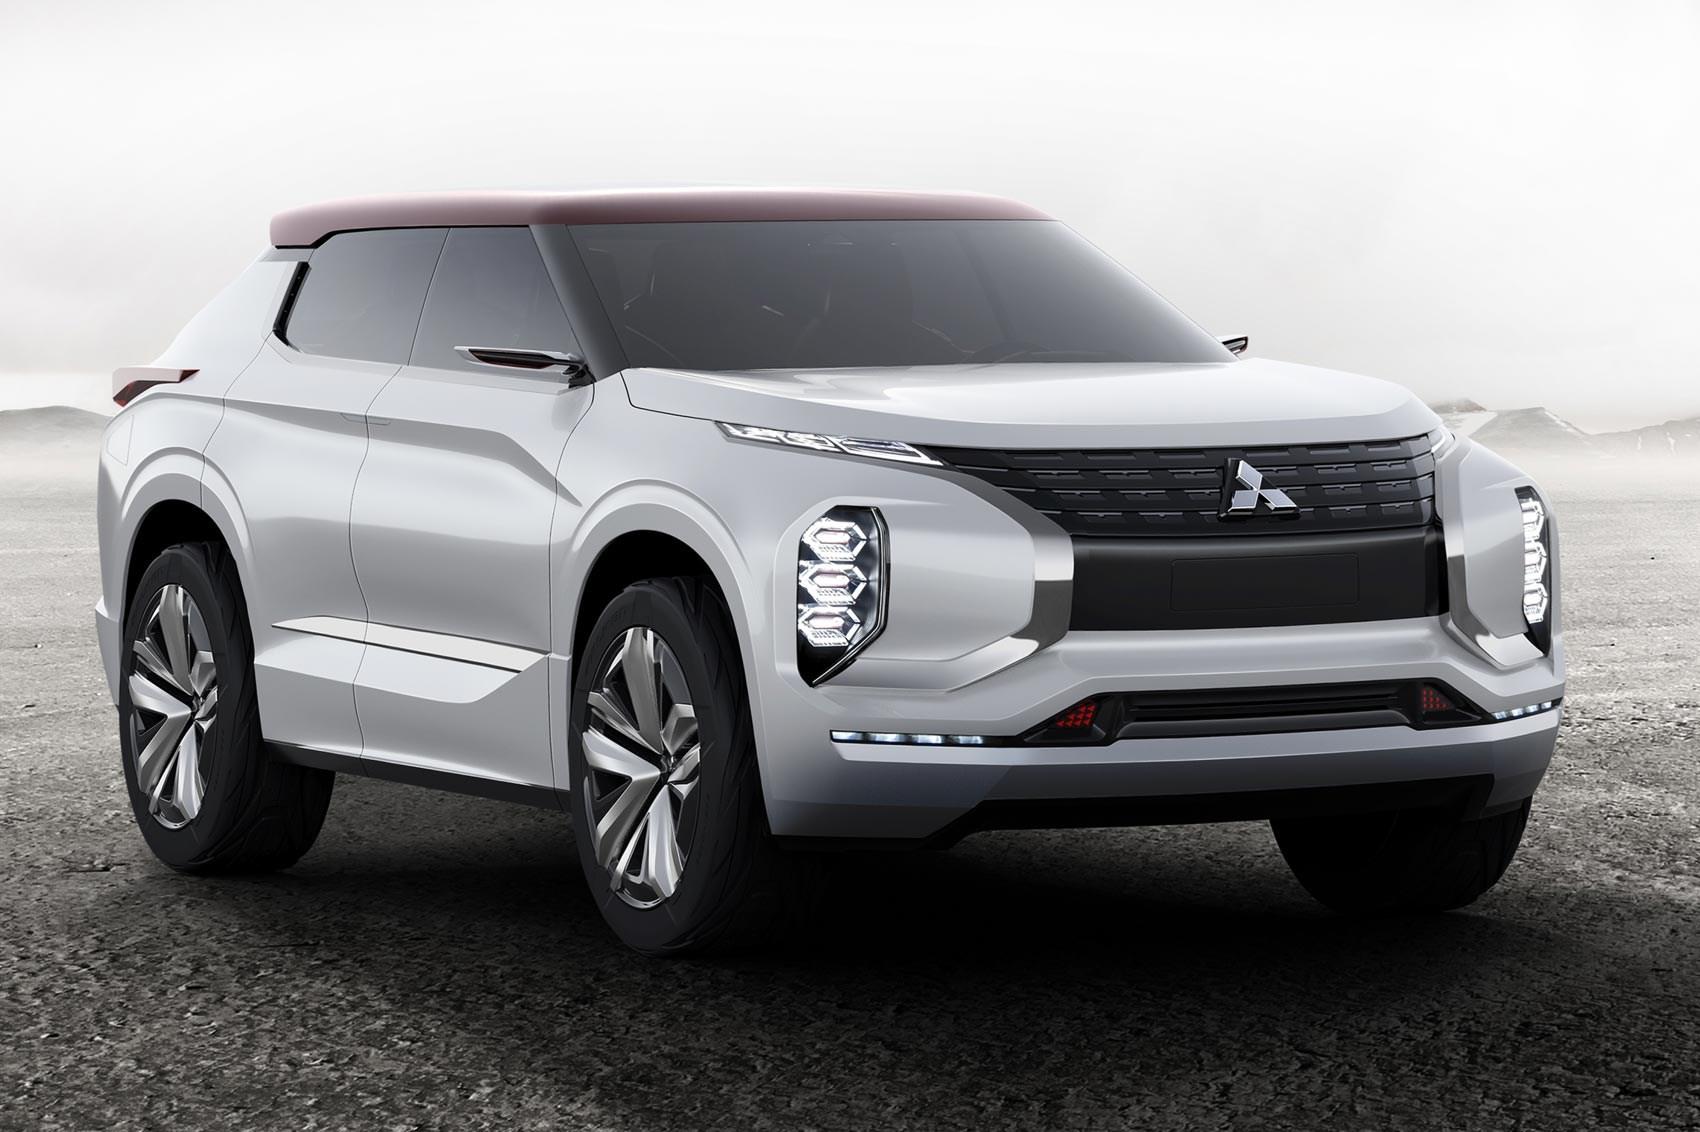 Triple Play Mitsubishi Gt Phev Concept Revealed At Paris 2016 Car Magazine